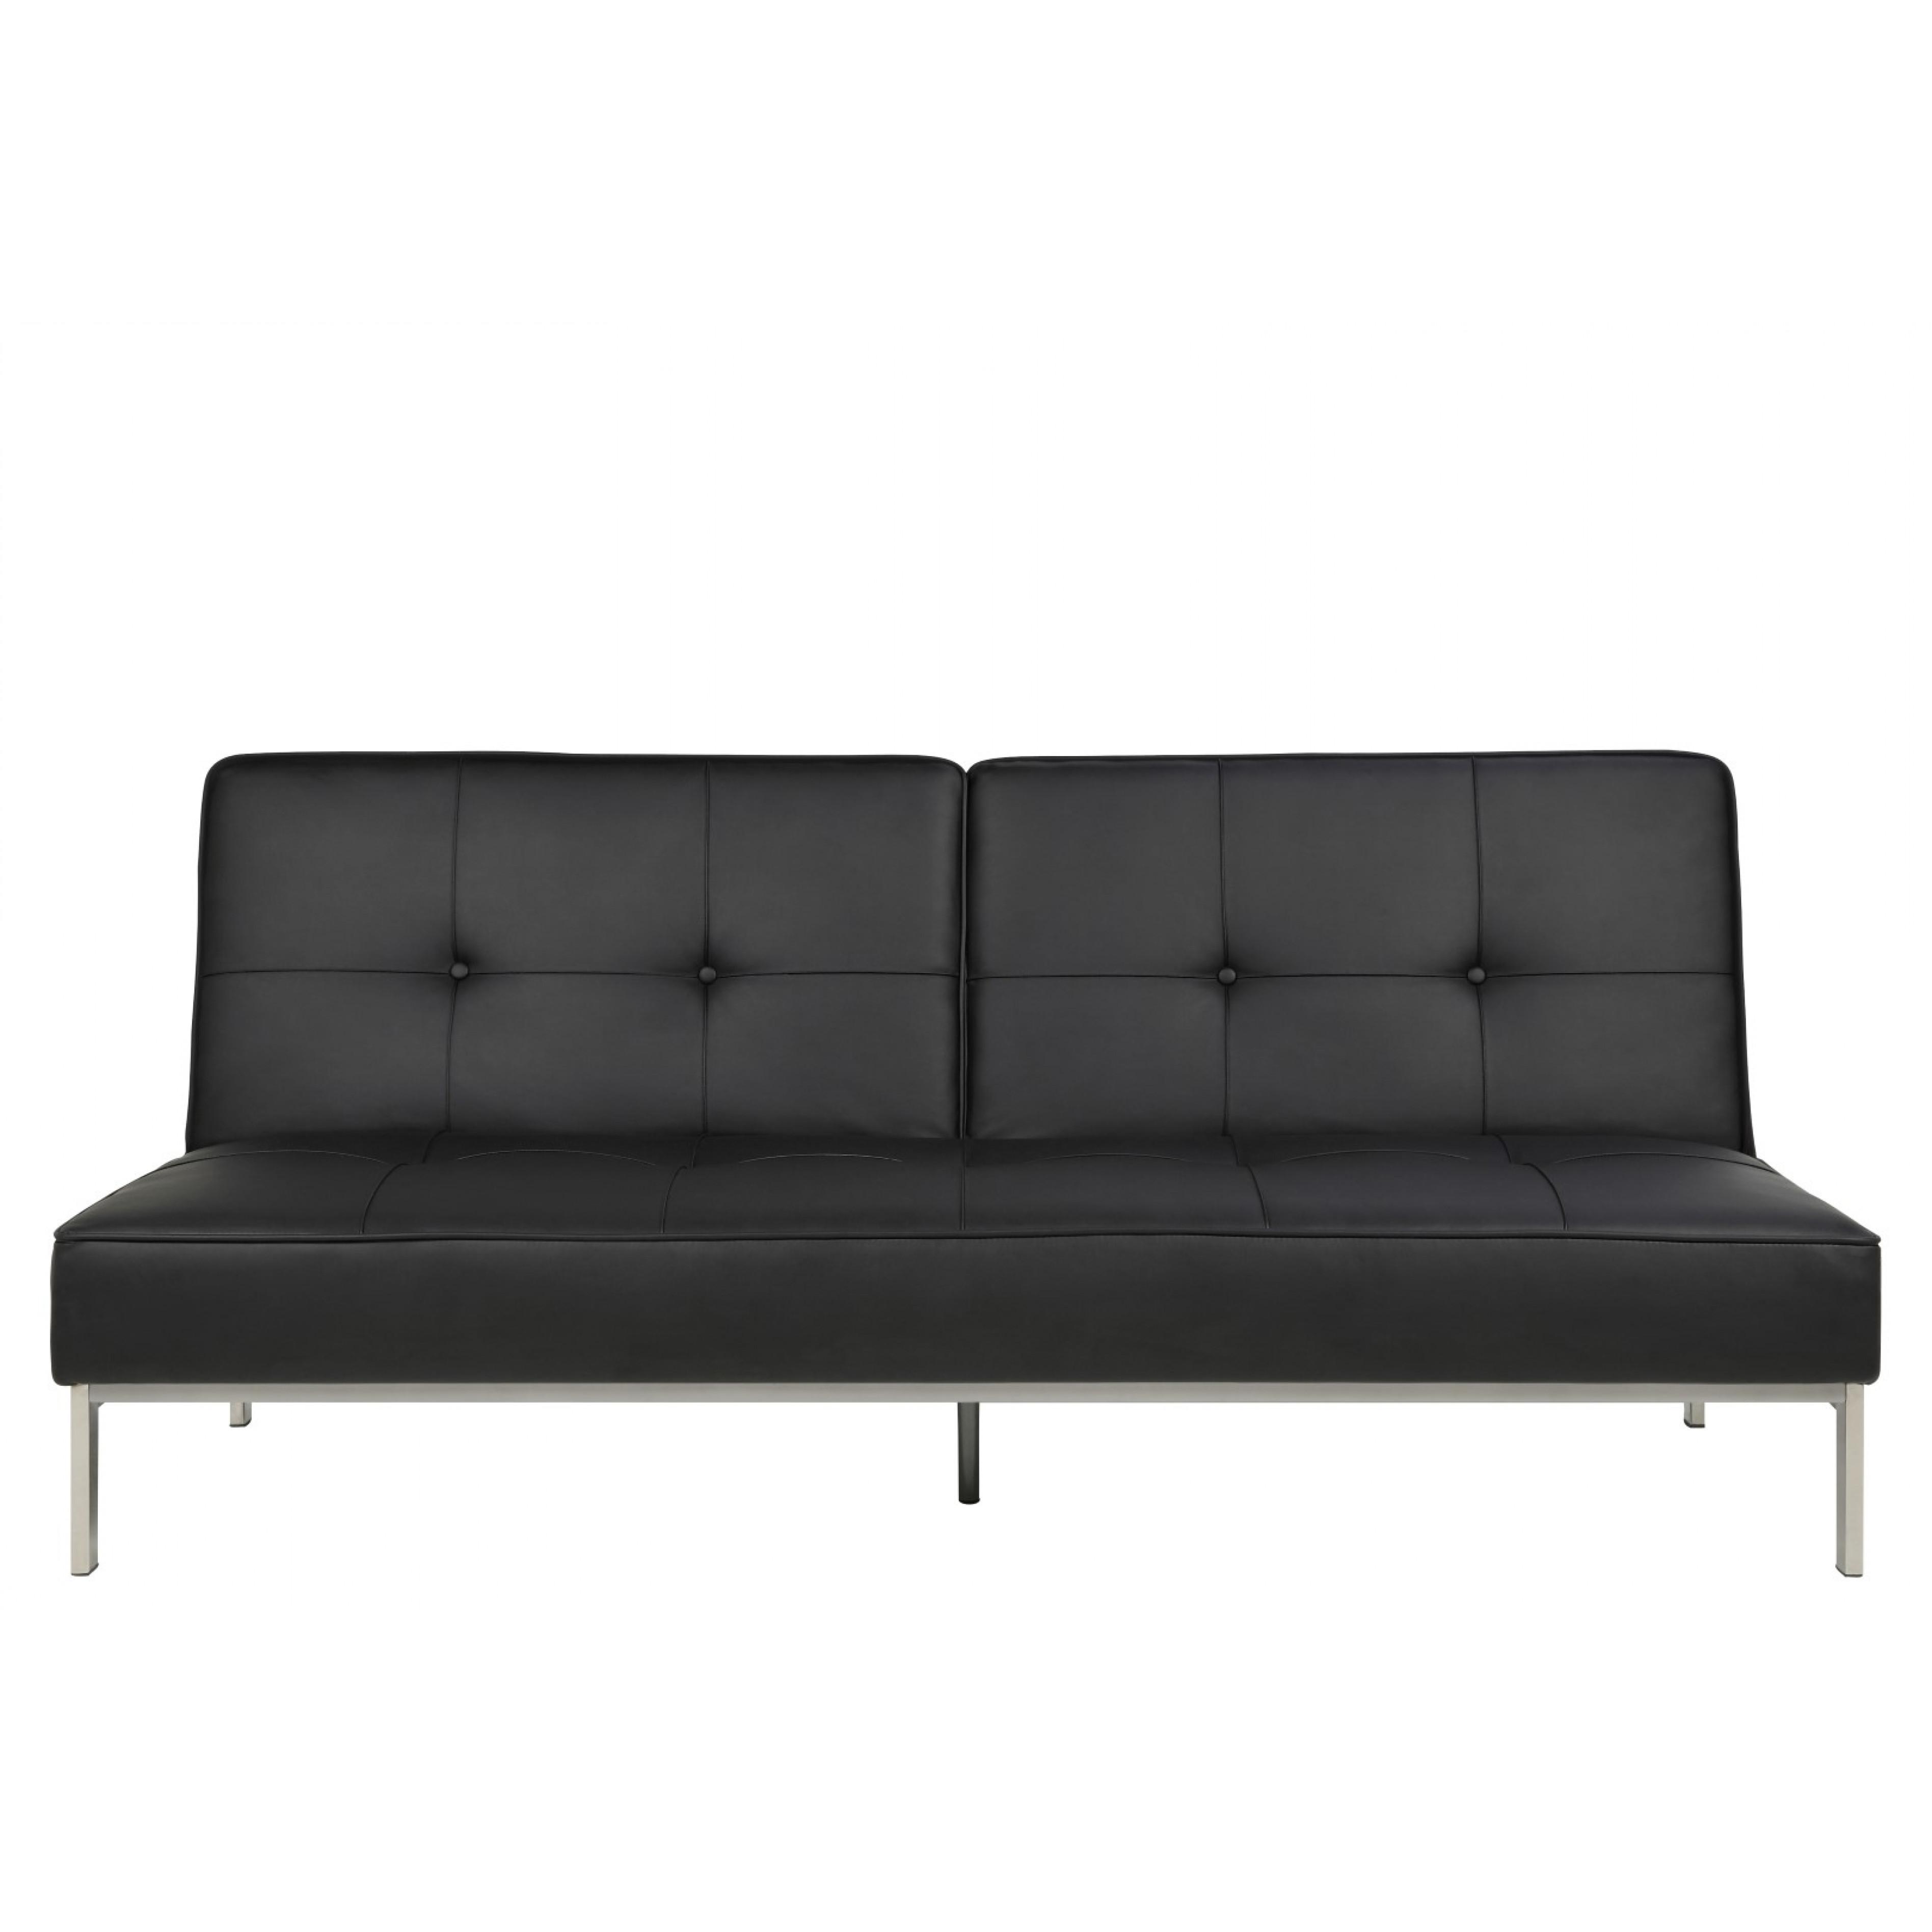 Sofa Bed Peralta | Black